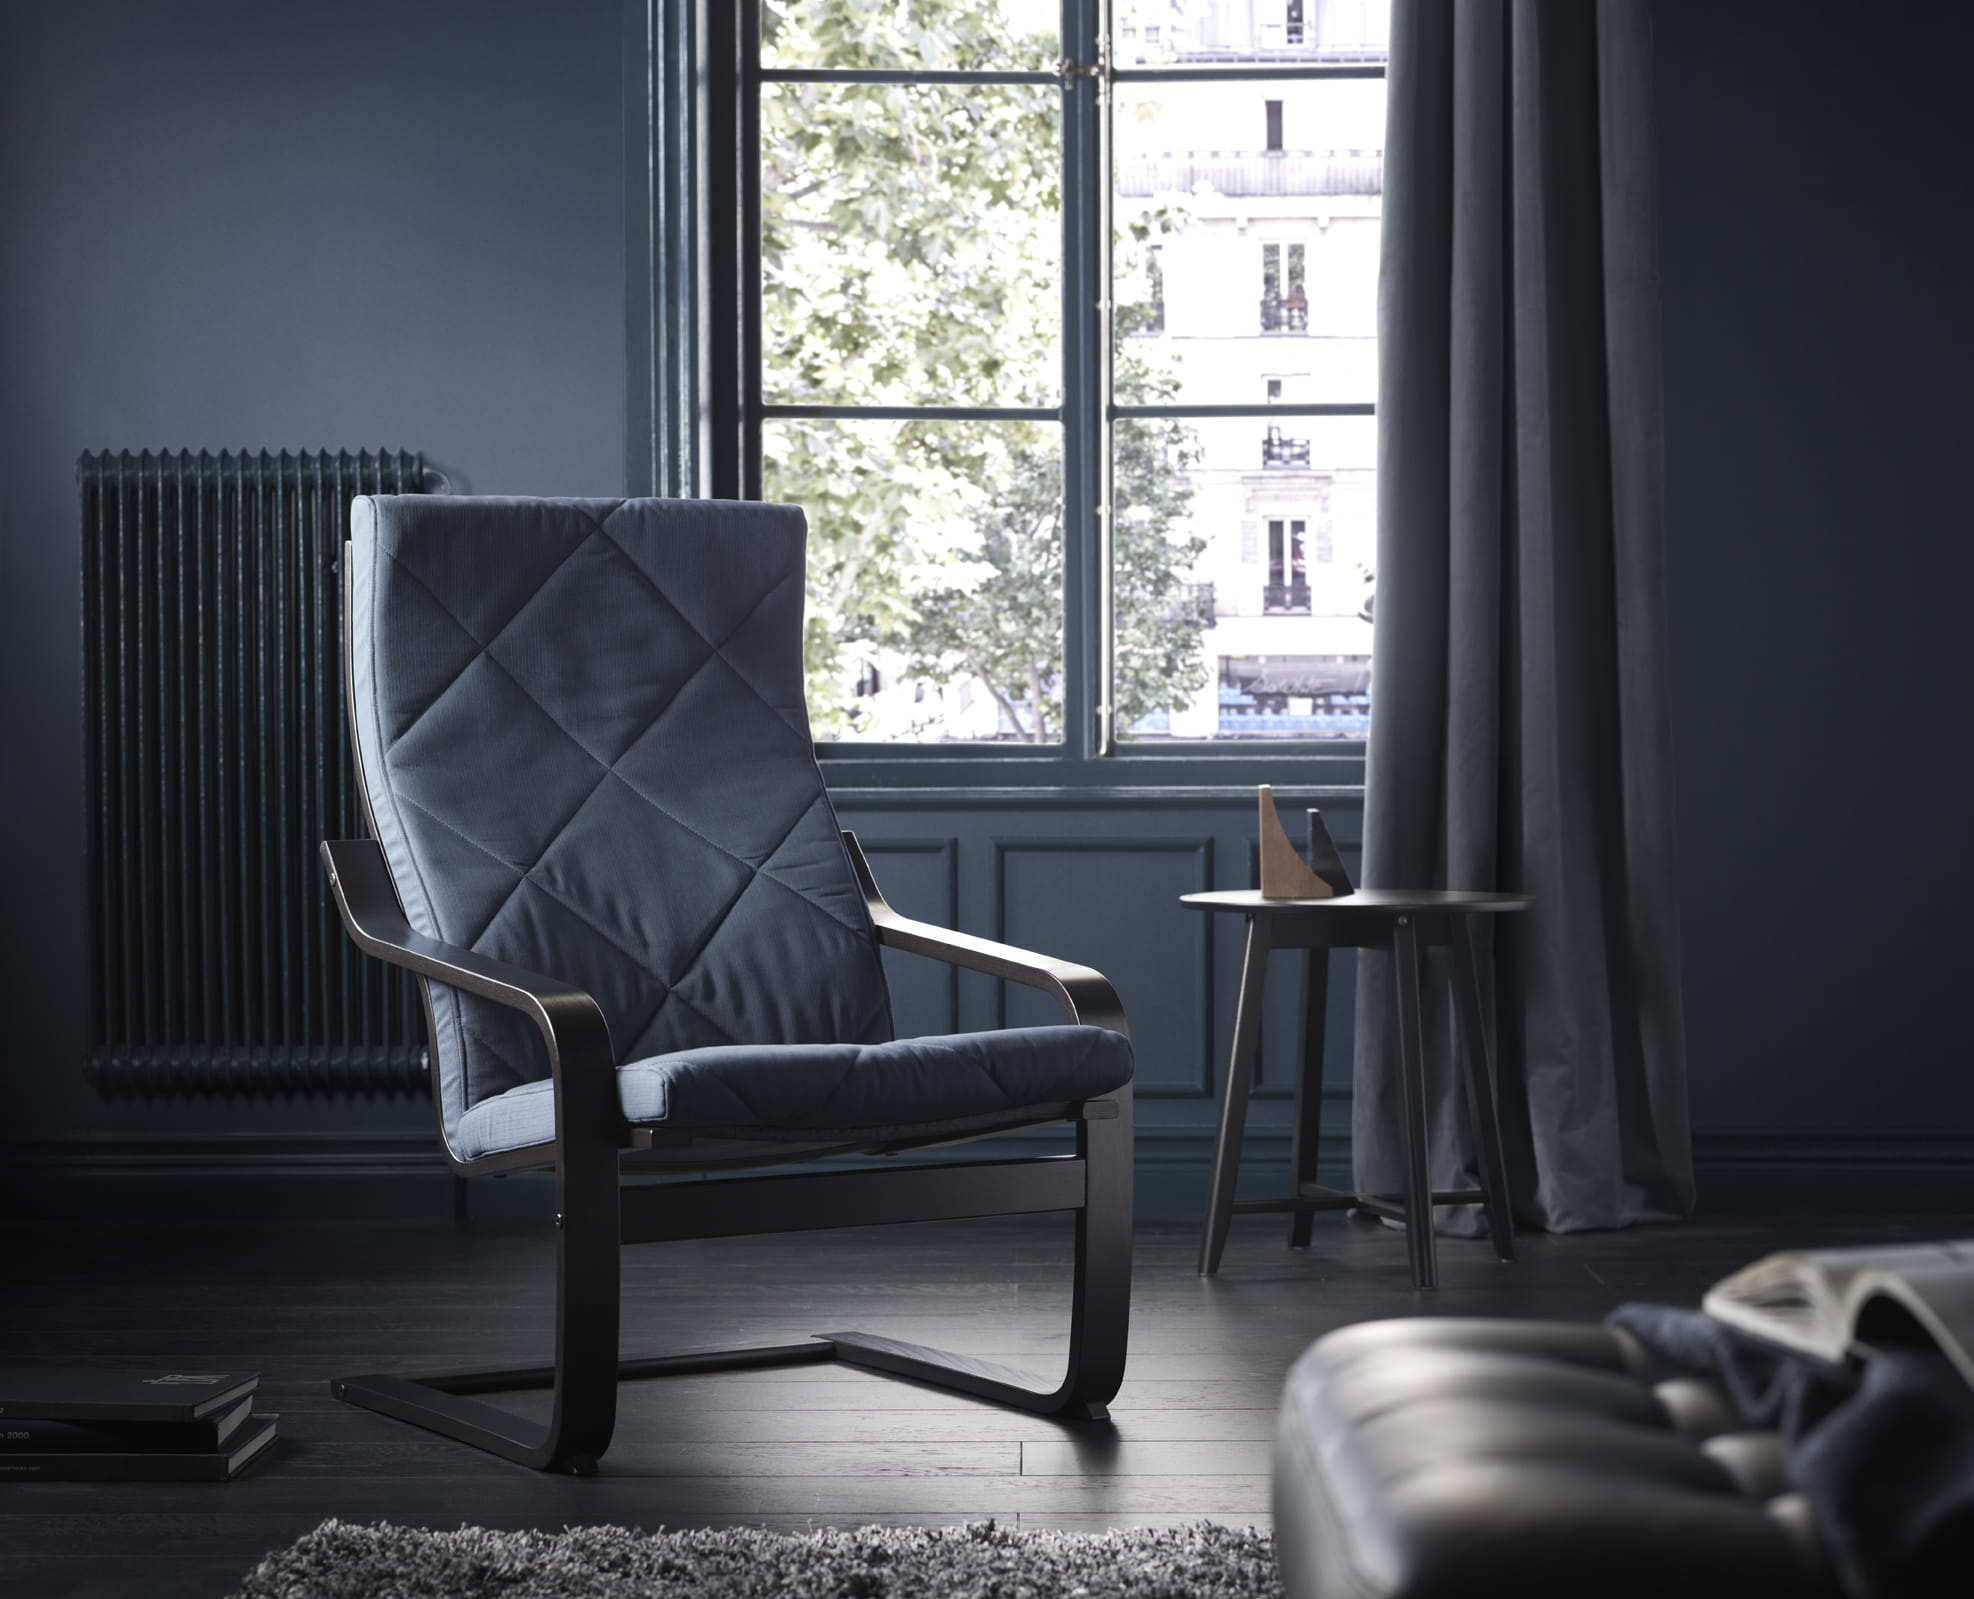 fauteuil pong edum bleu fonc prix 119 euros - Fauteuil Ikea Bleu